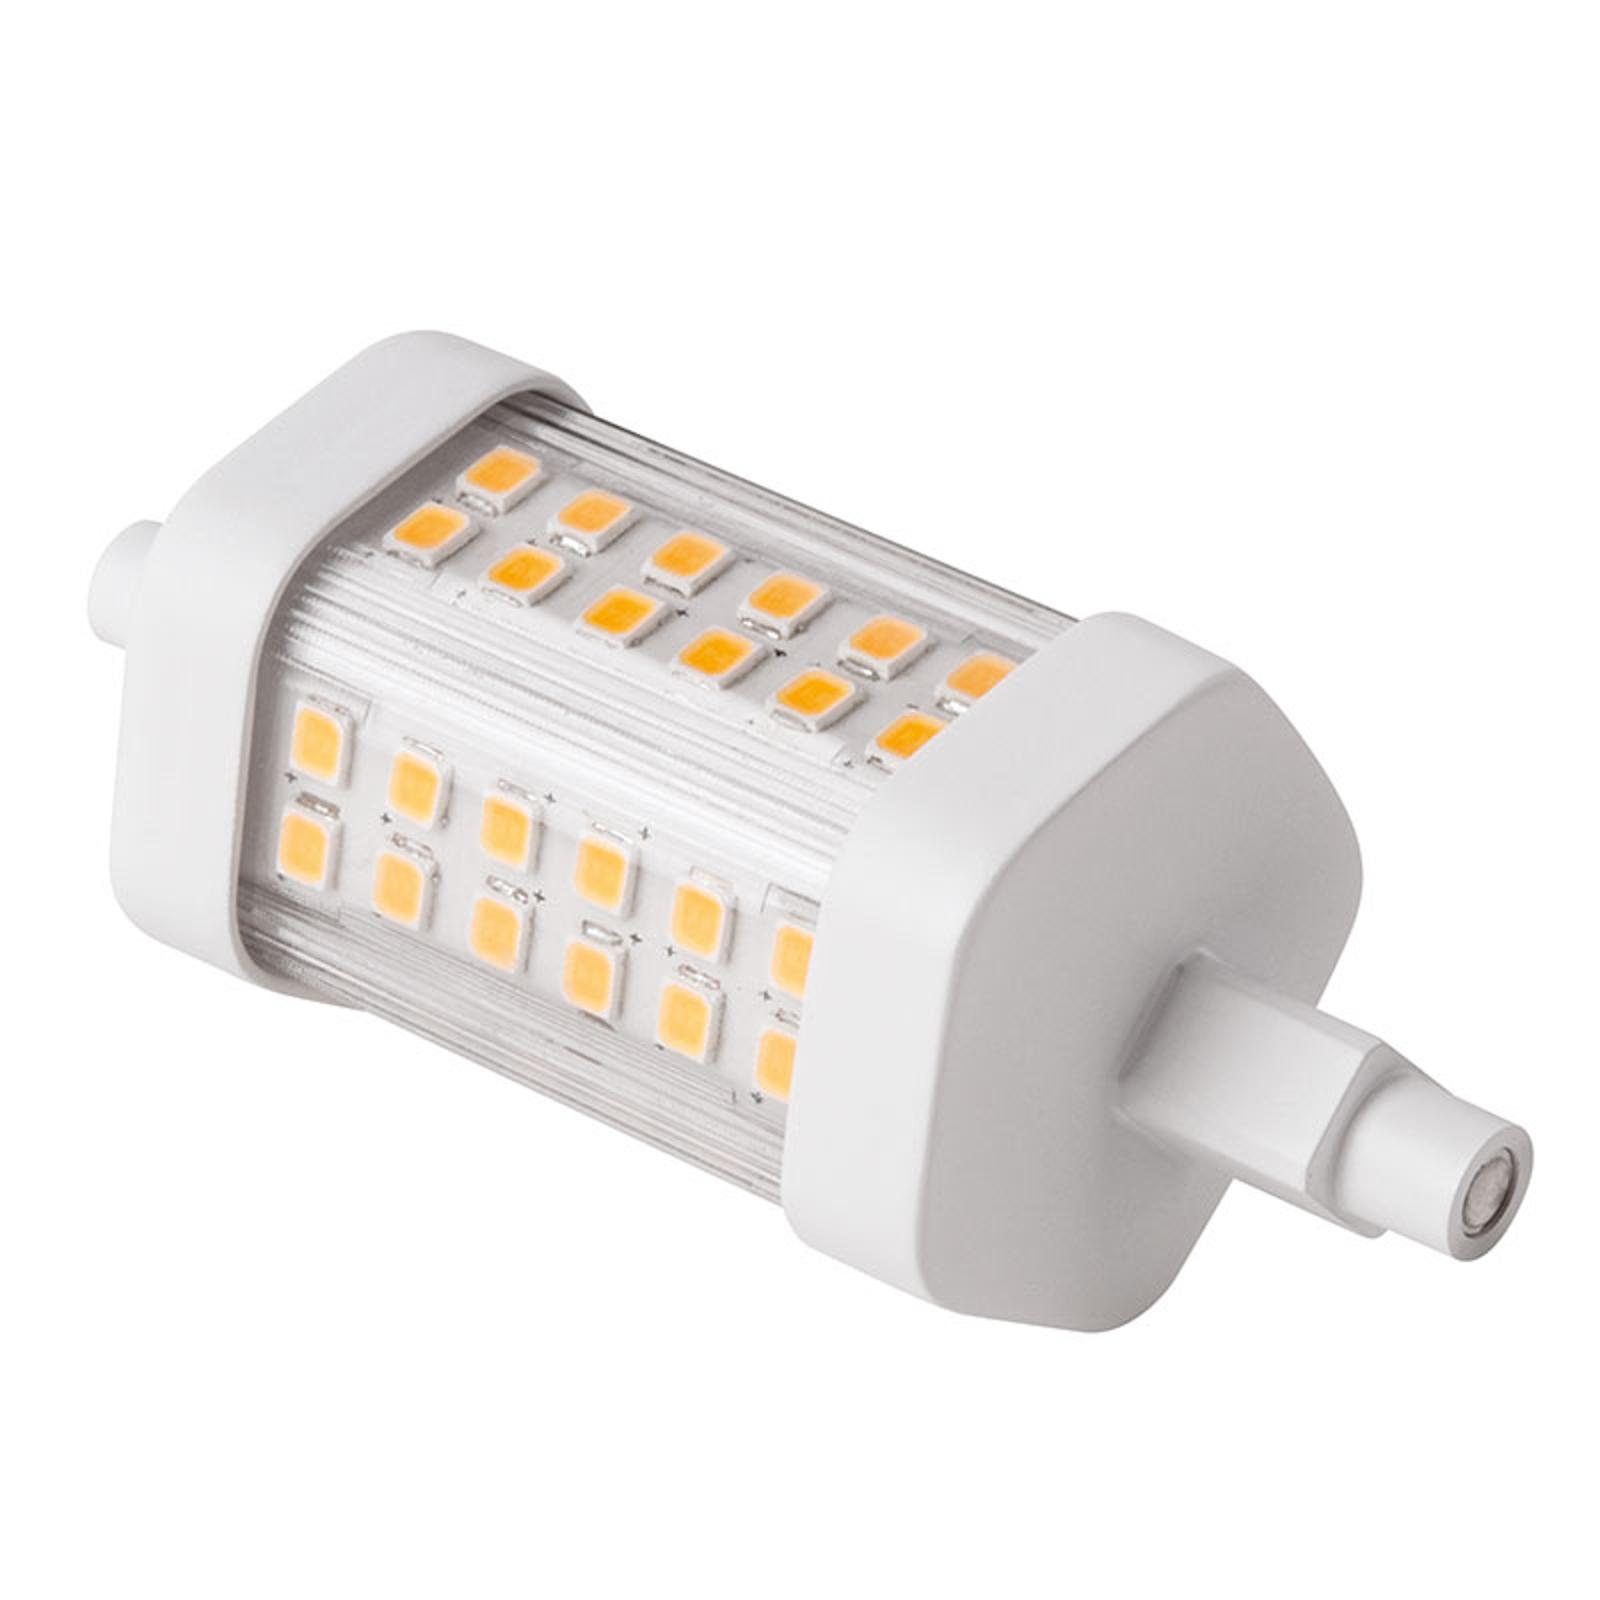 LED-Stablampe R7s 78mm 8W warmweiß